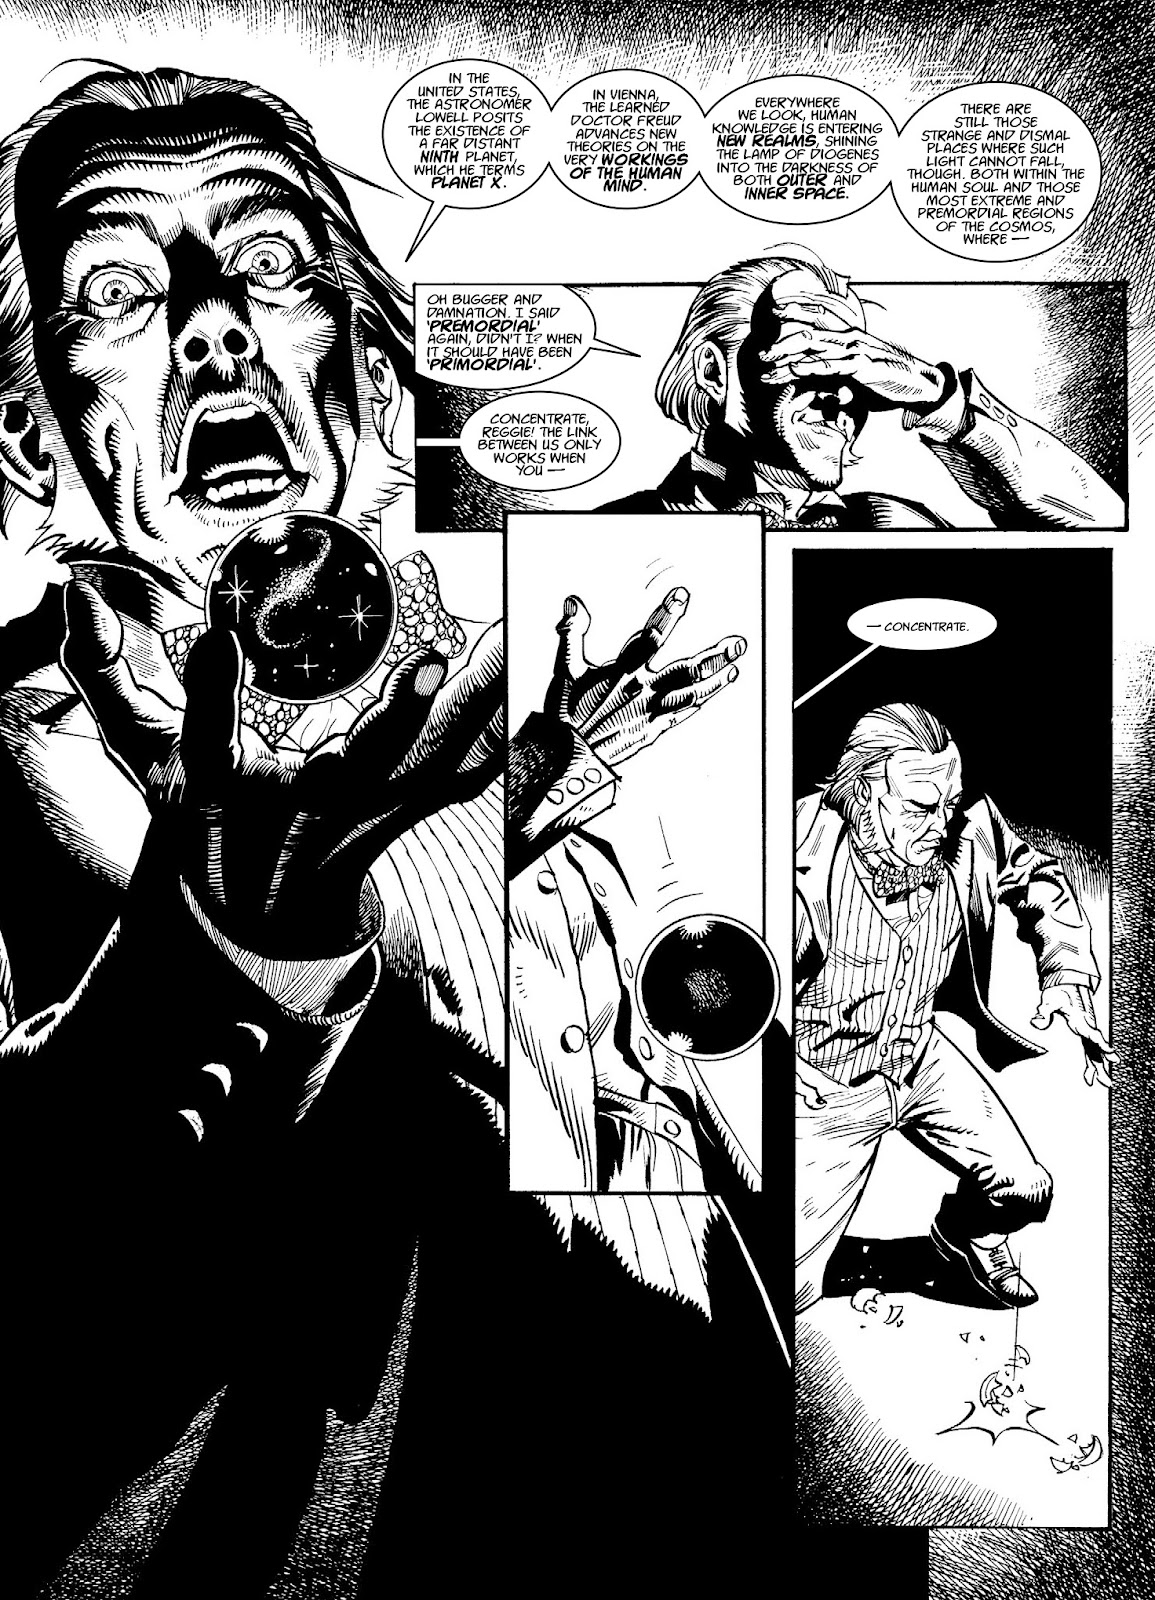 Judge Dredd Megazine (Vol. 5) issue 427 - Page 67